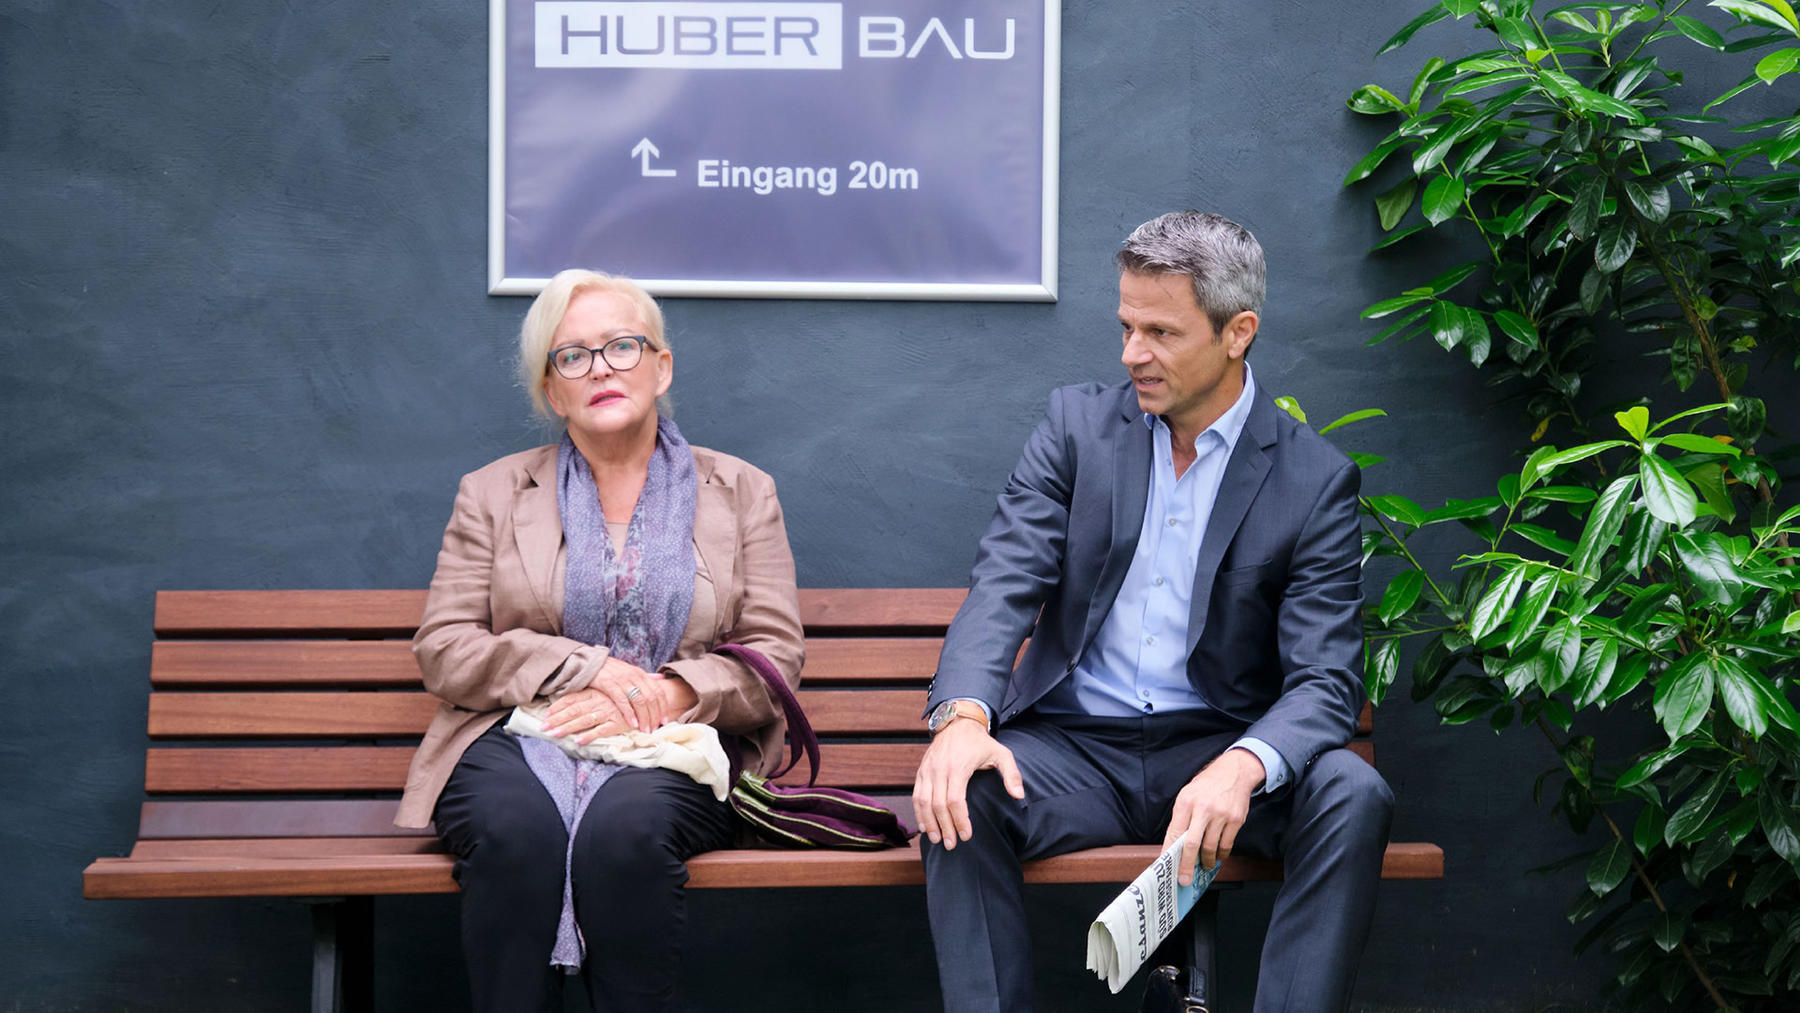 Benedikt will Huber Bau ohne Tills Hilfe retten